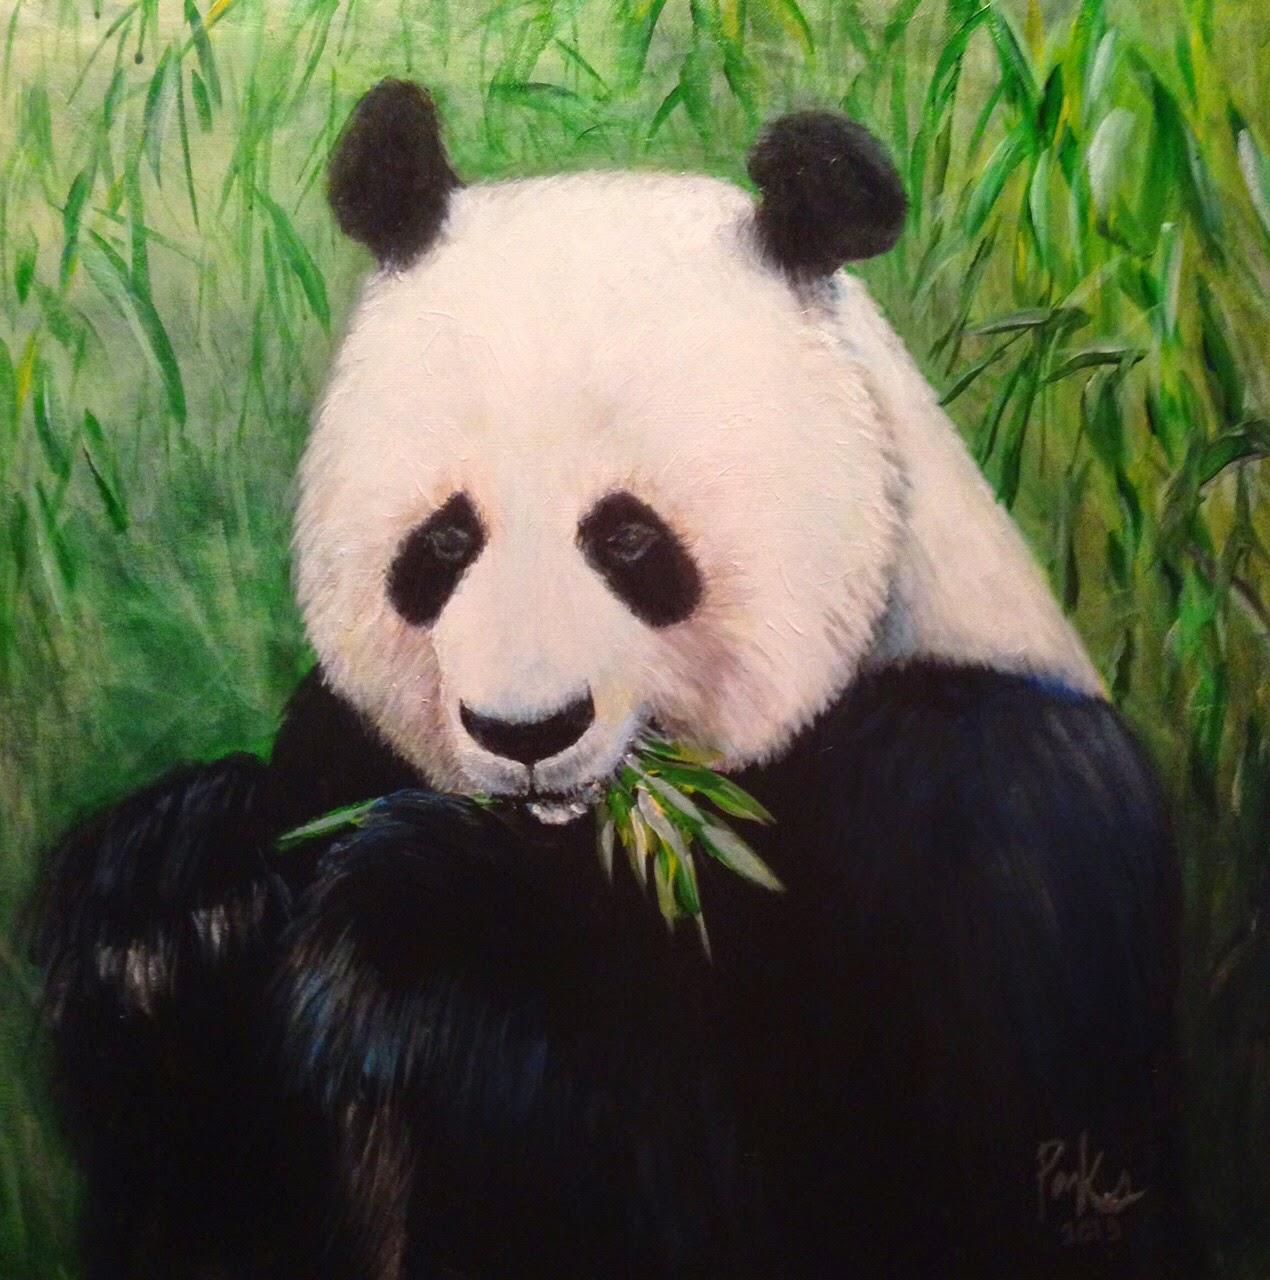 Panda n Bamboo